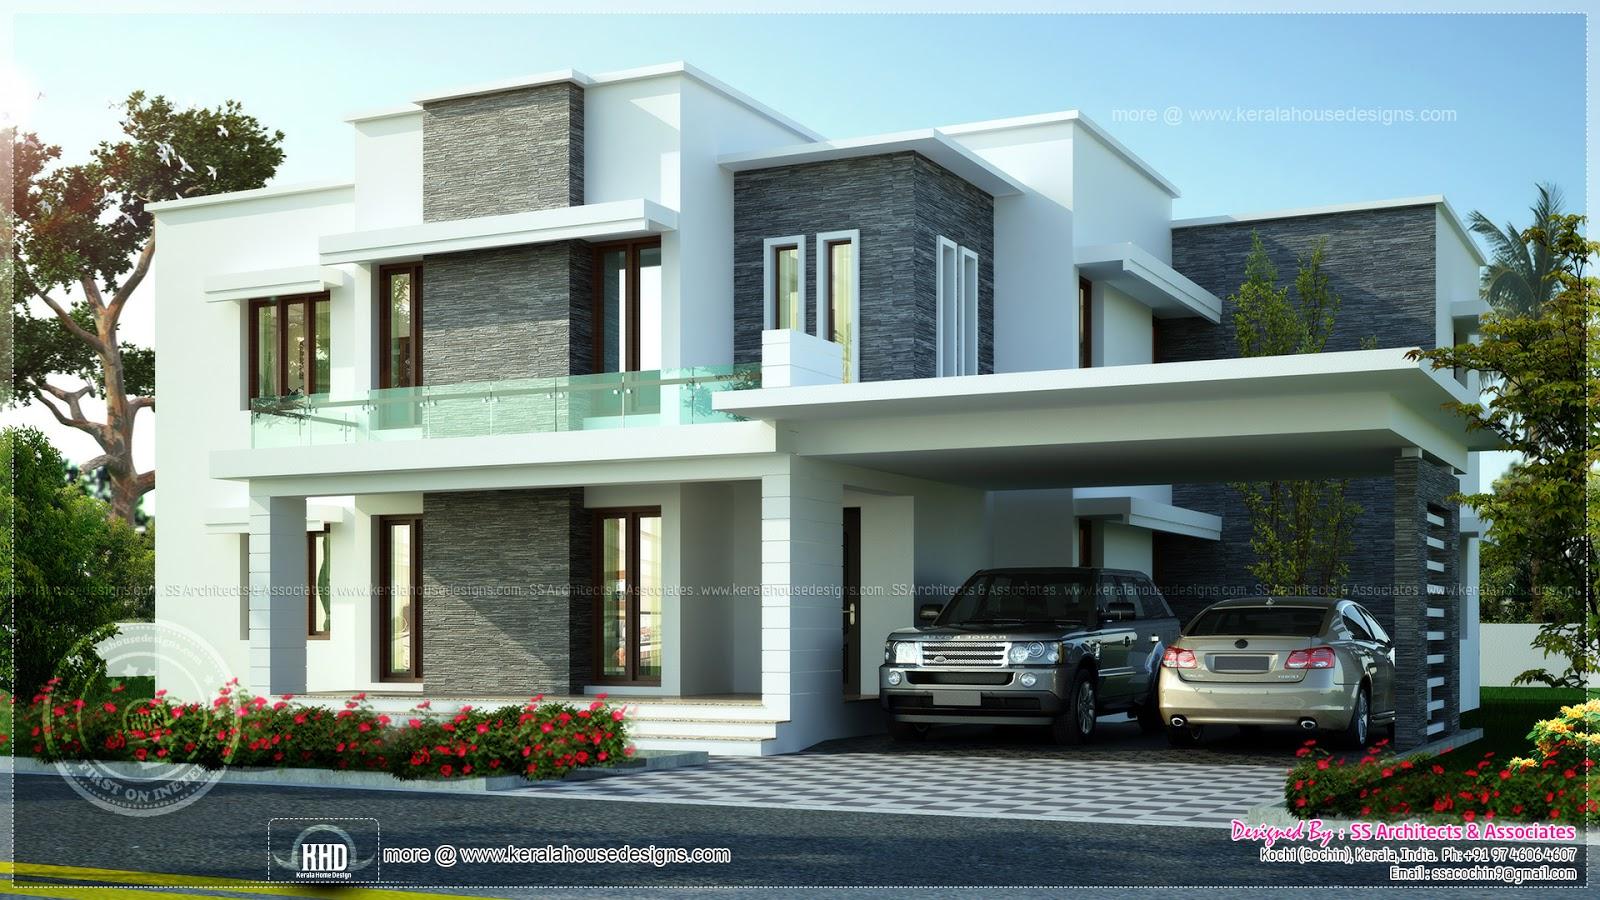 Modern residential villas designs dubai awesome bedroom villa design kerala home floor plans house plans on